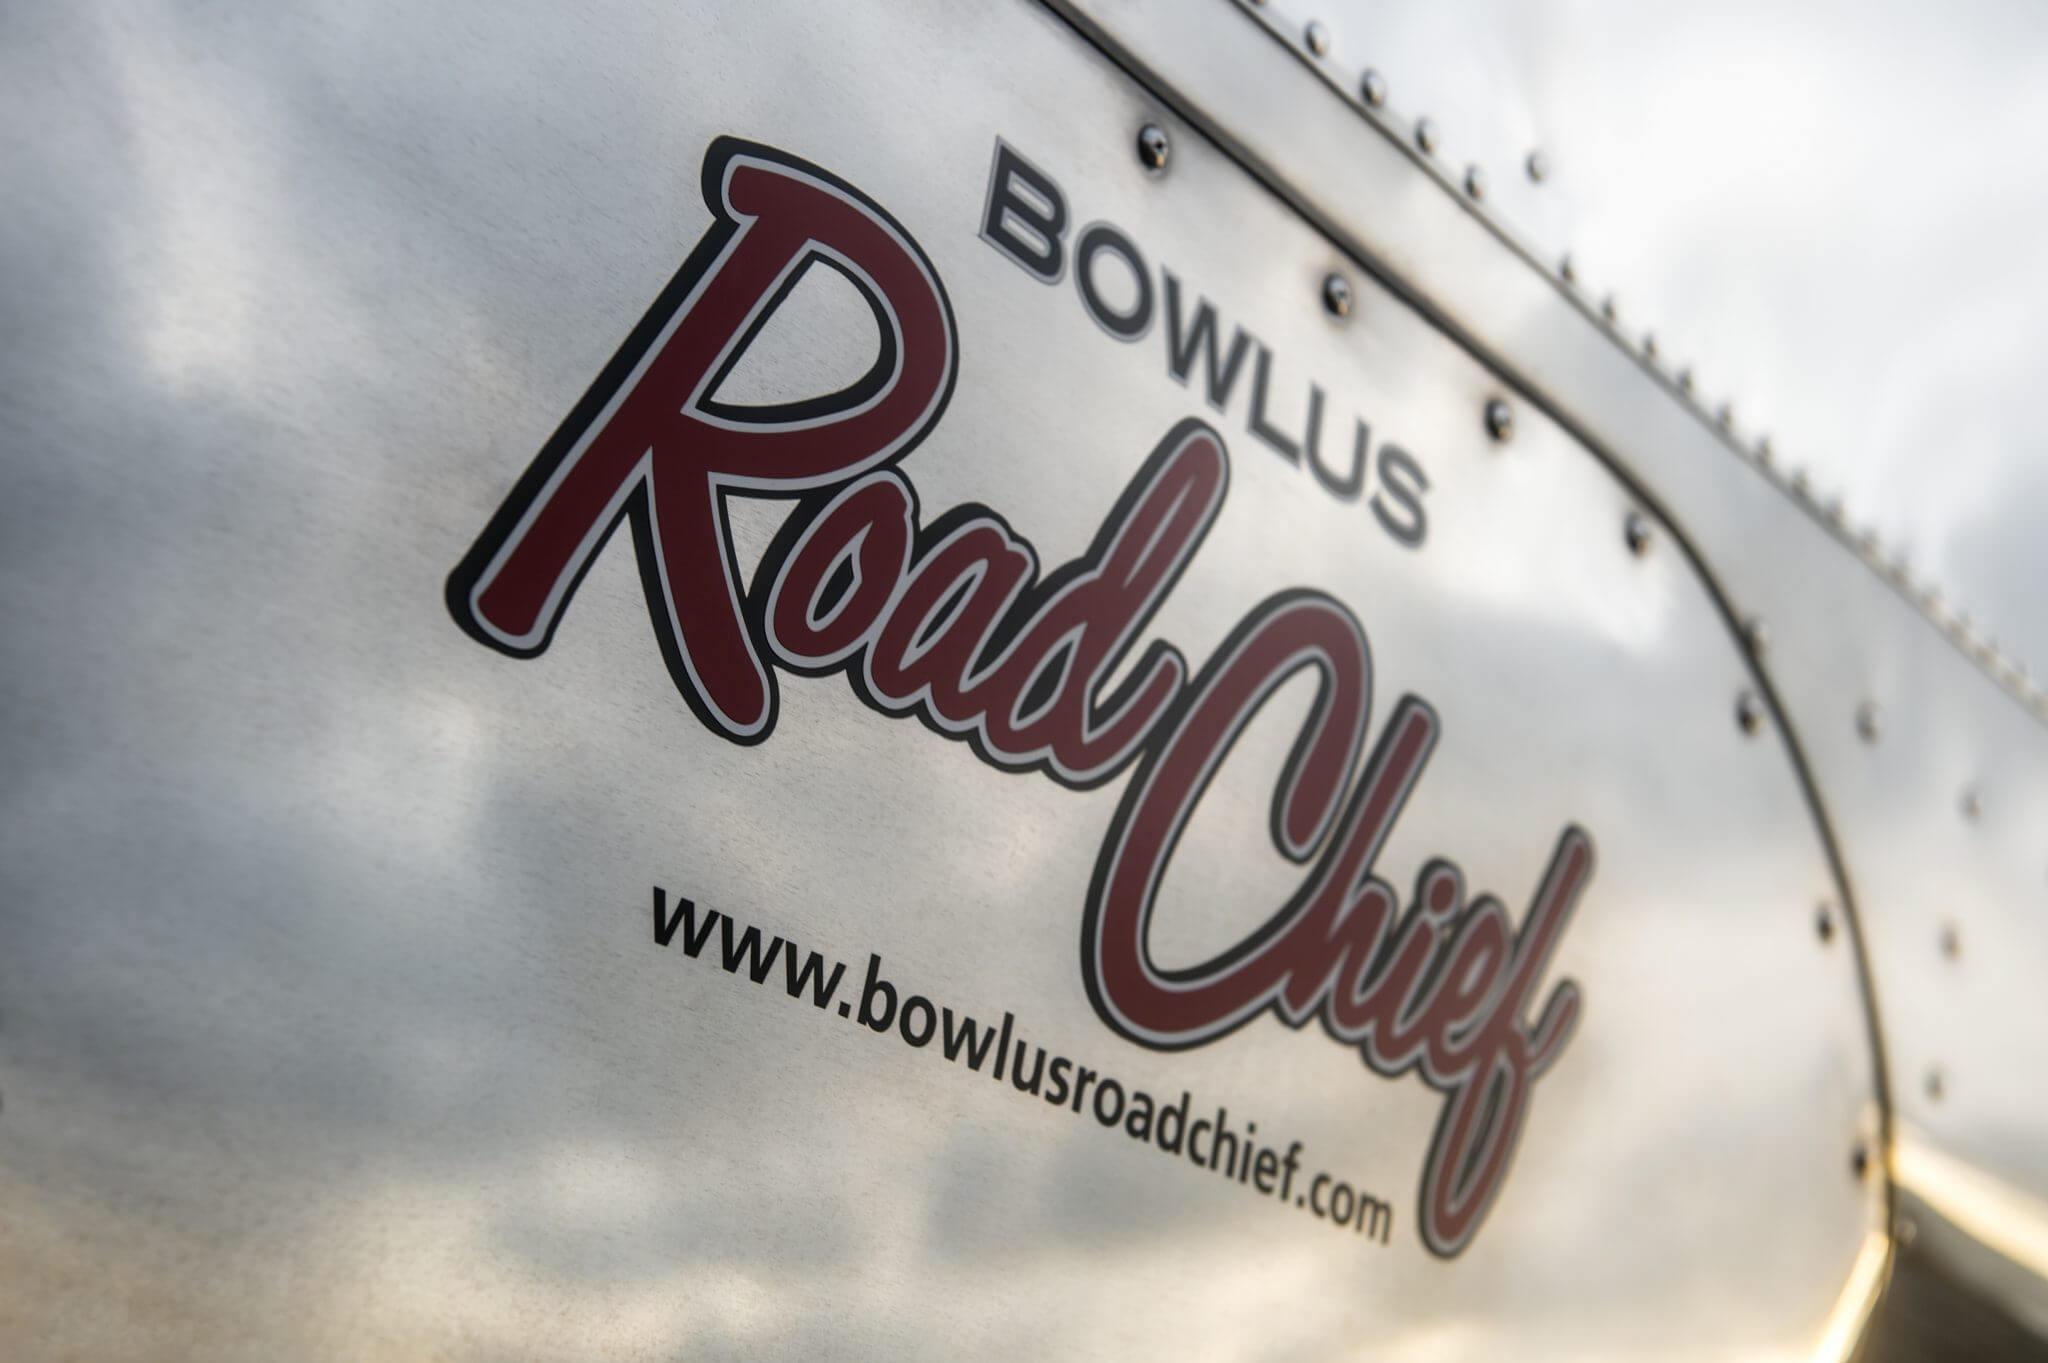 Naming Your Bowlus Road Chief